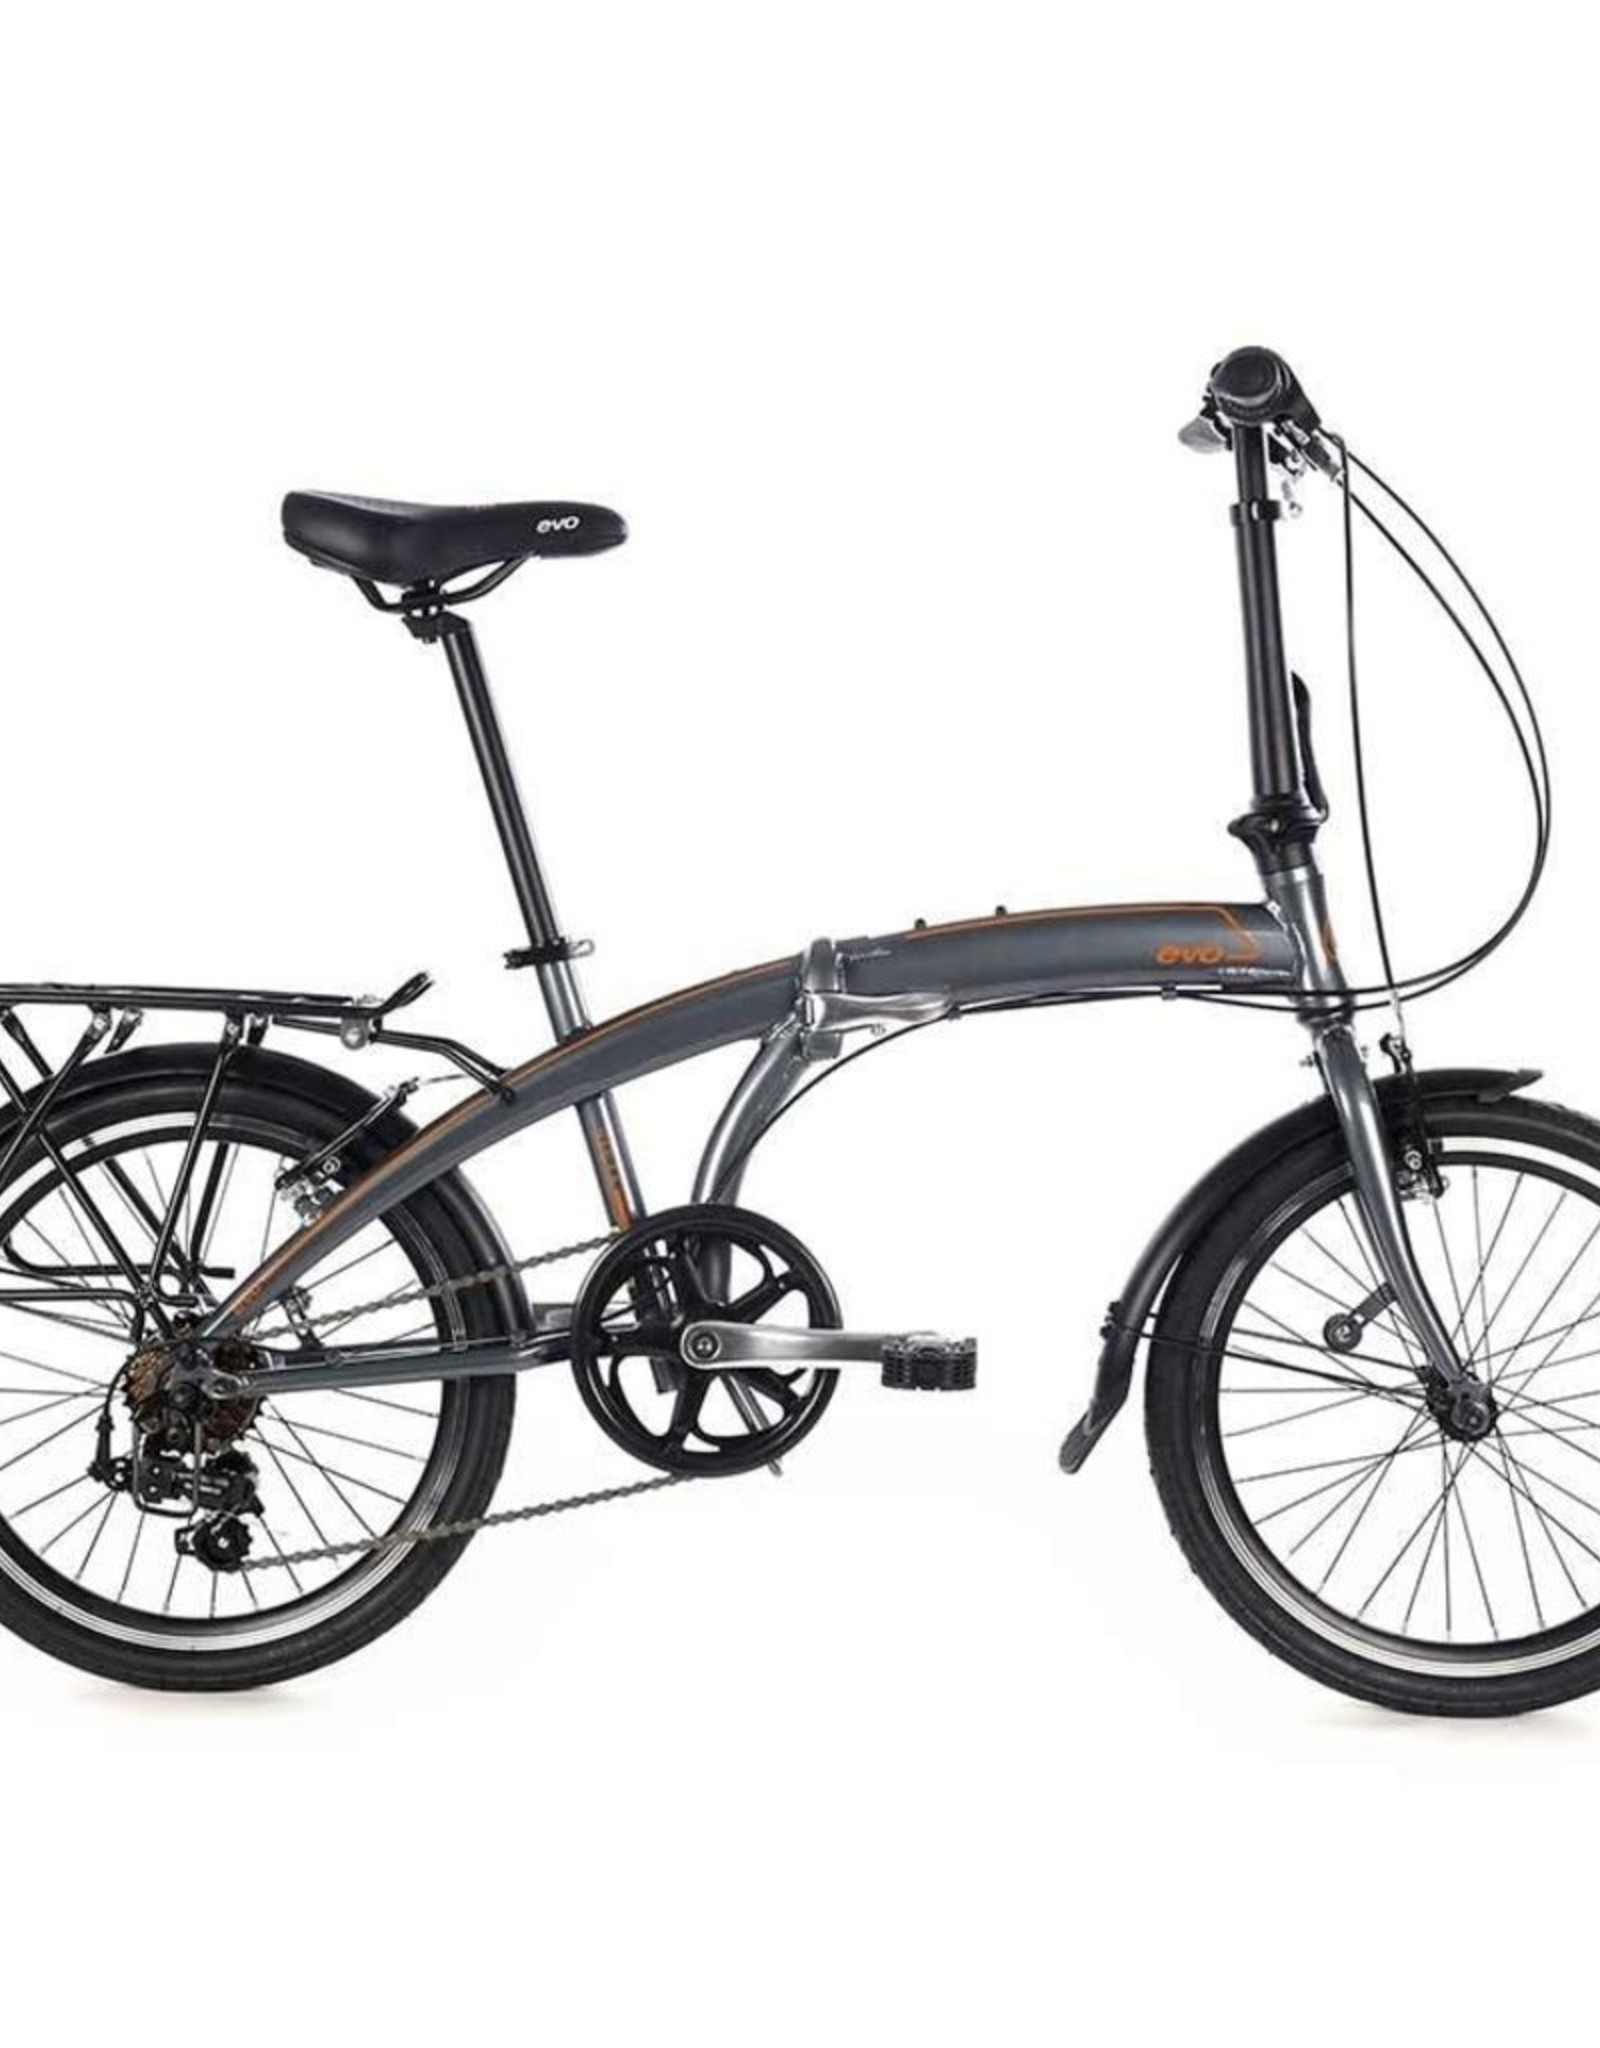 EVO EVO, Vista Folding City Bicycle GREY